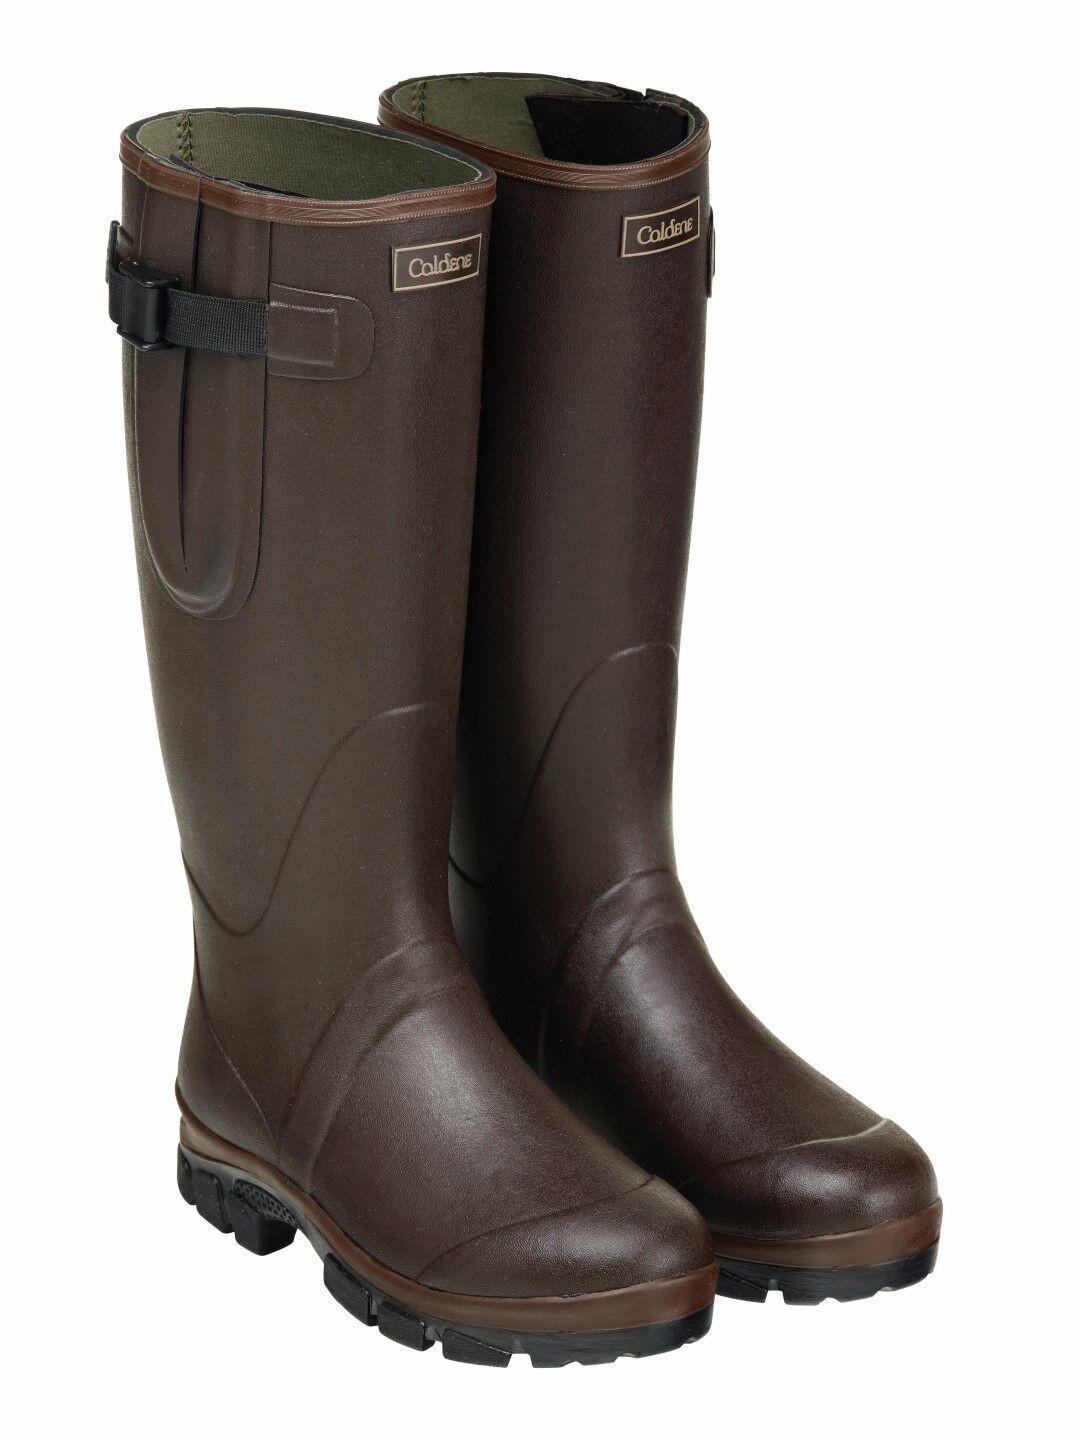 Caldene equestrian unisex westfield wellington rubber boots with neoprene lining   on sale 70% off